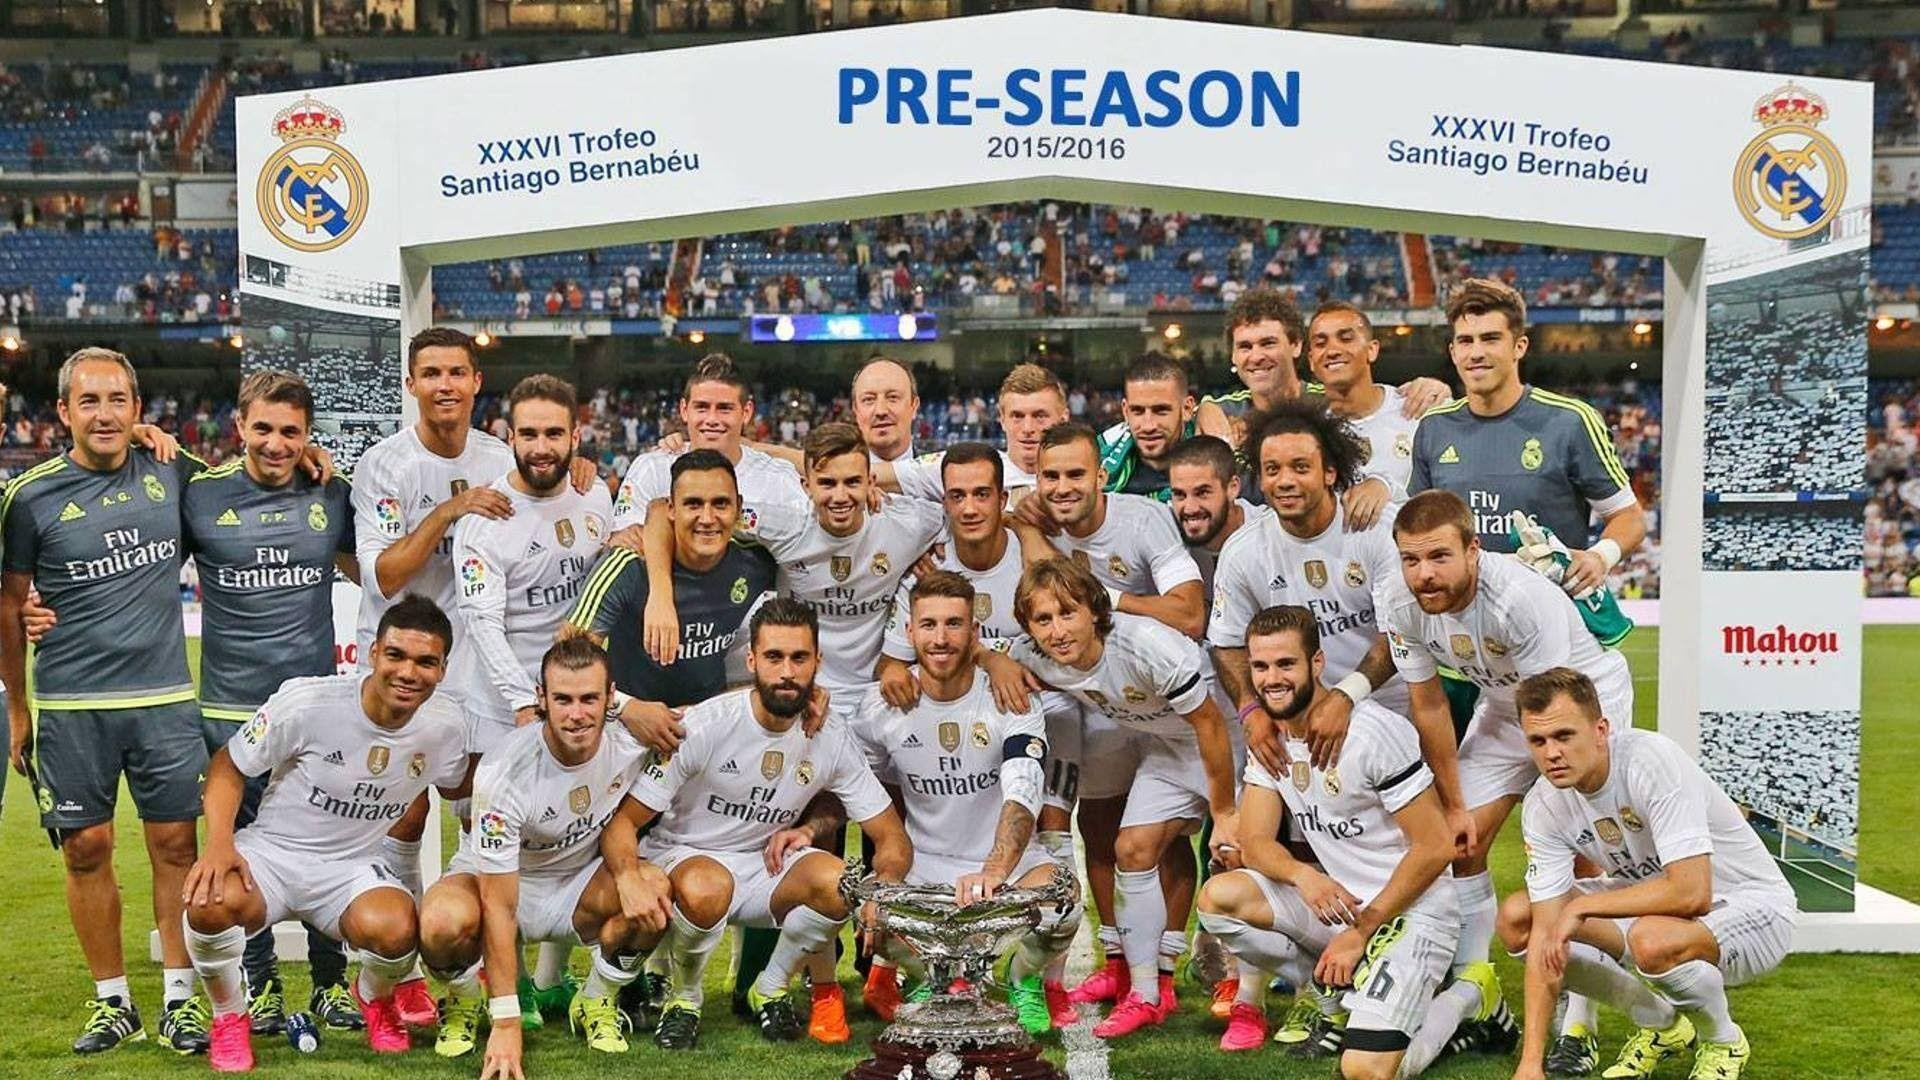 Real Madrid Logo Wallpapers 2016 HD - Wallpaper Cave